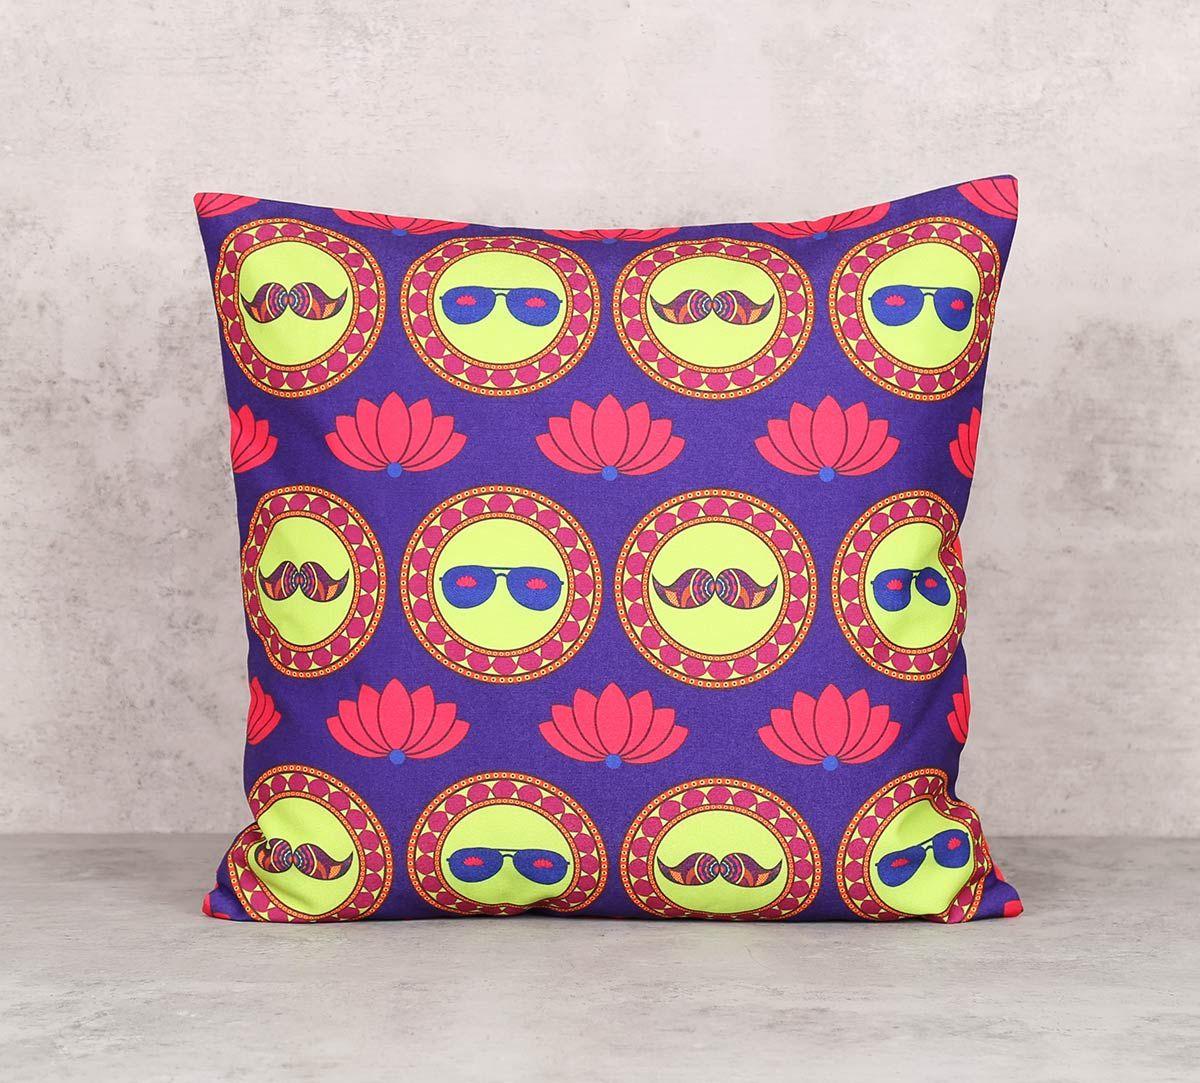 India Circus C'est La Vie Canvas Blend 16 x 16 Cushion Cover